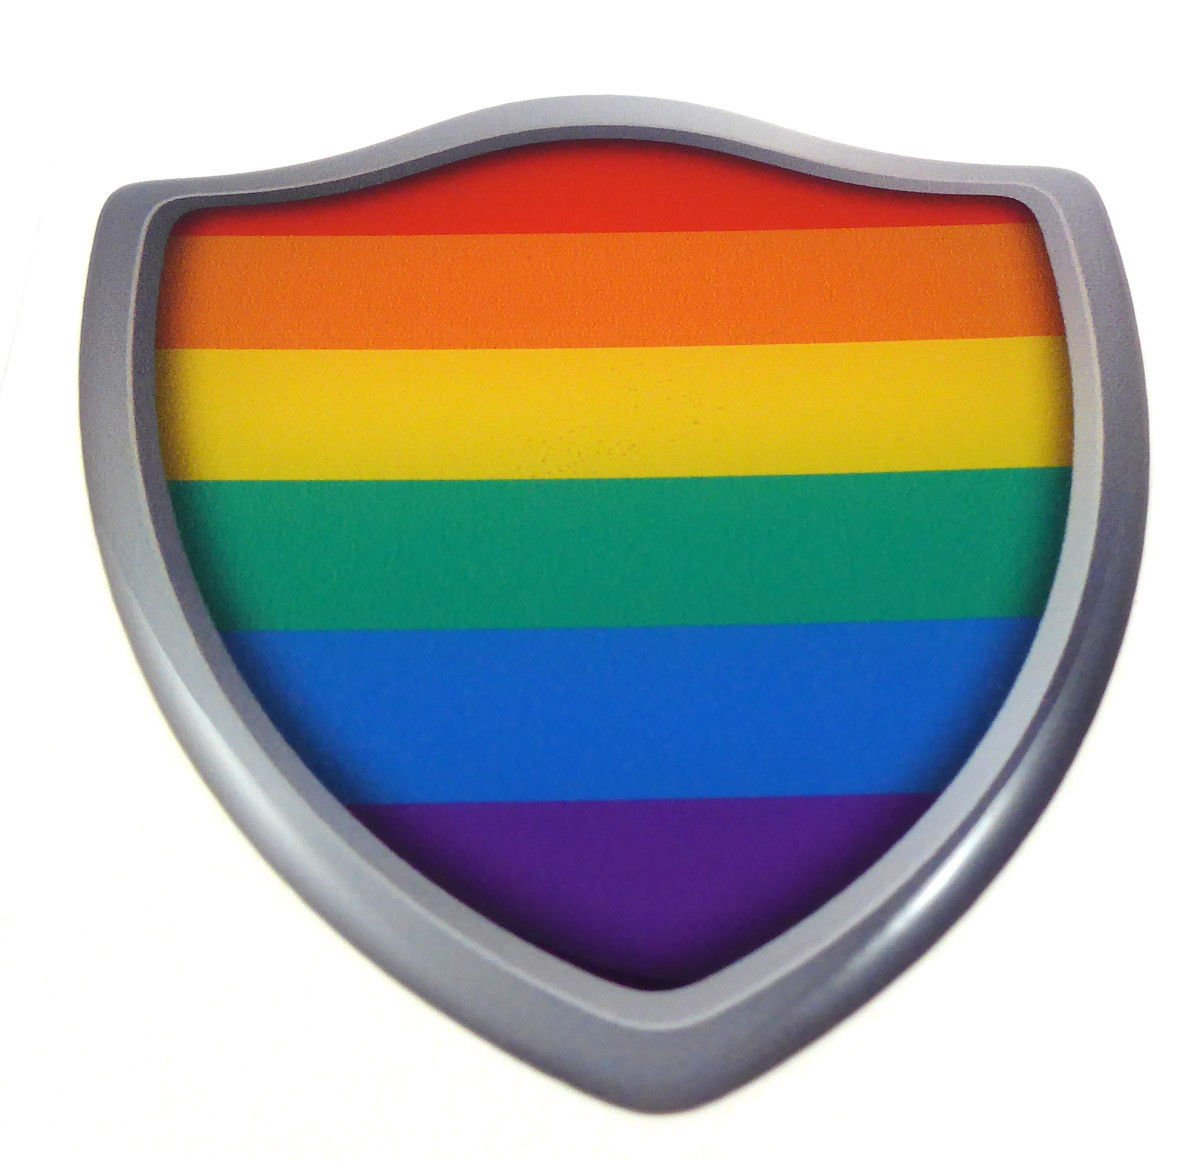 Pride Lesbian Gay Flag Shield Domed Decal 3D Look Emblem Resin car Sticker 2.6x3